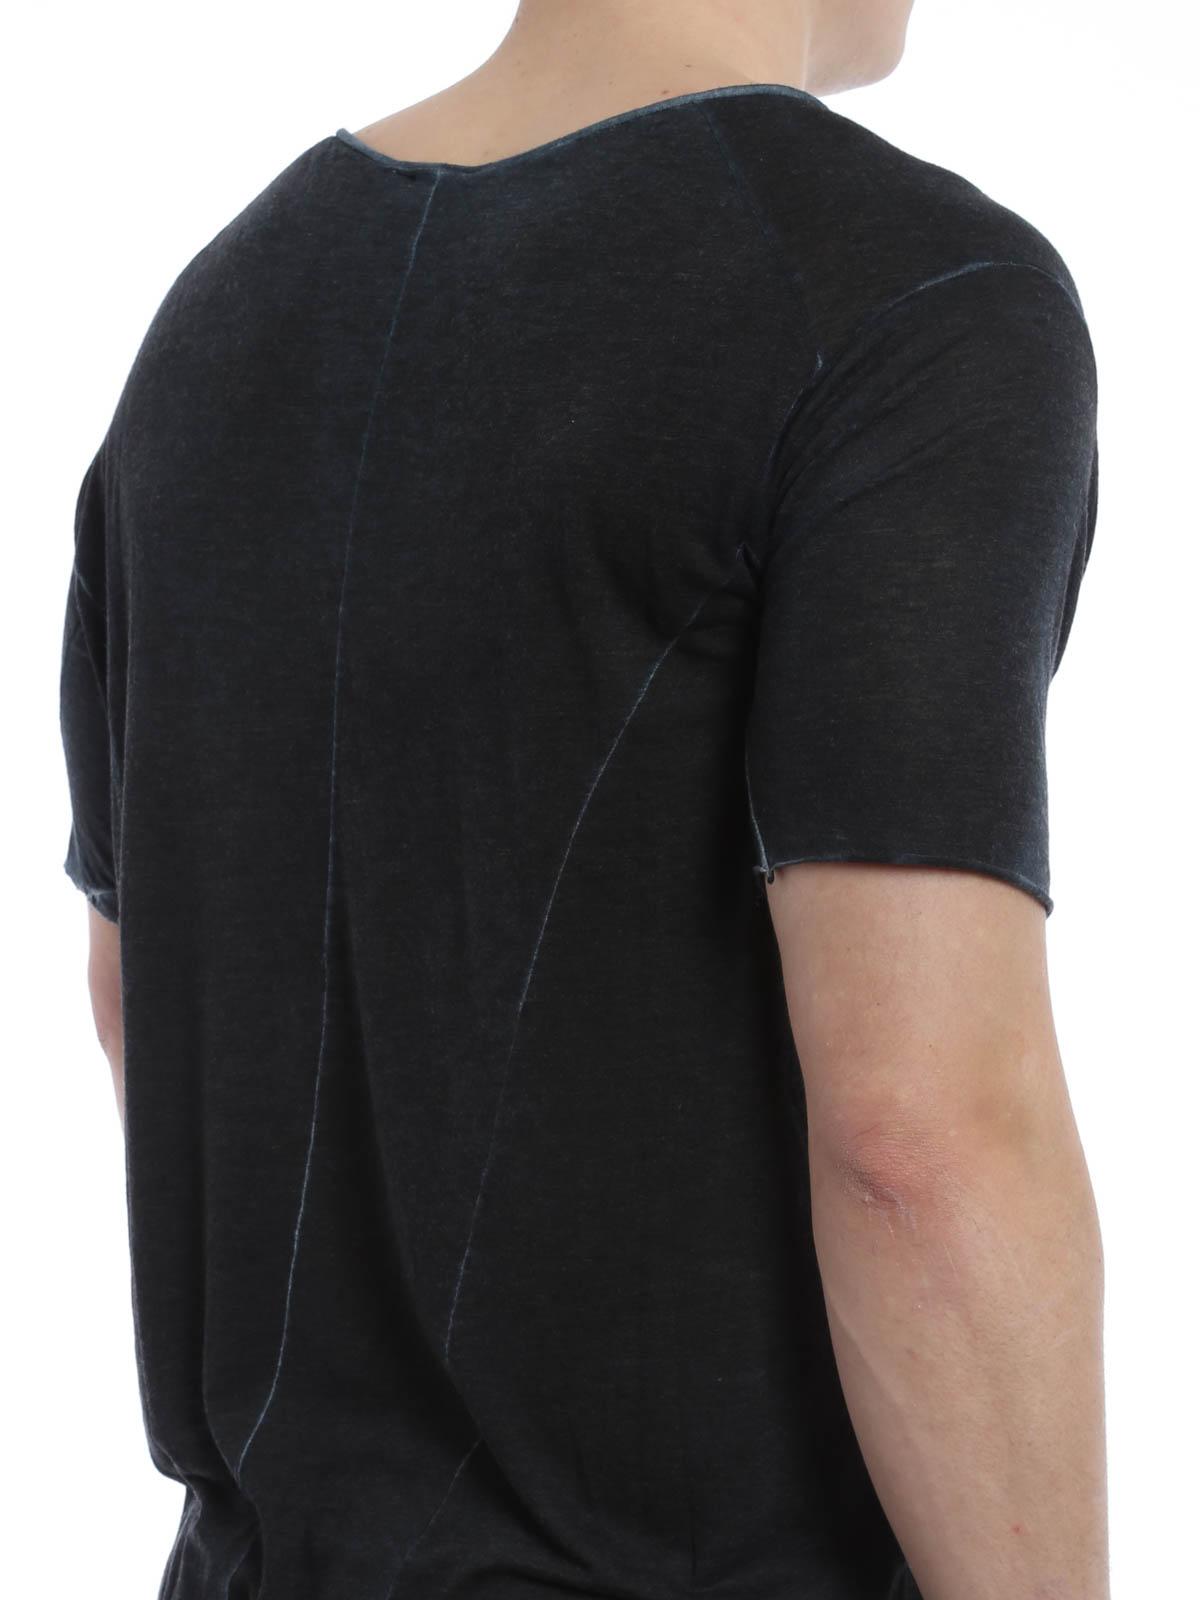 V neck t shirt de avant toi camisetas ikrix ikrix for V neck t shirt online shopping